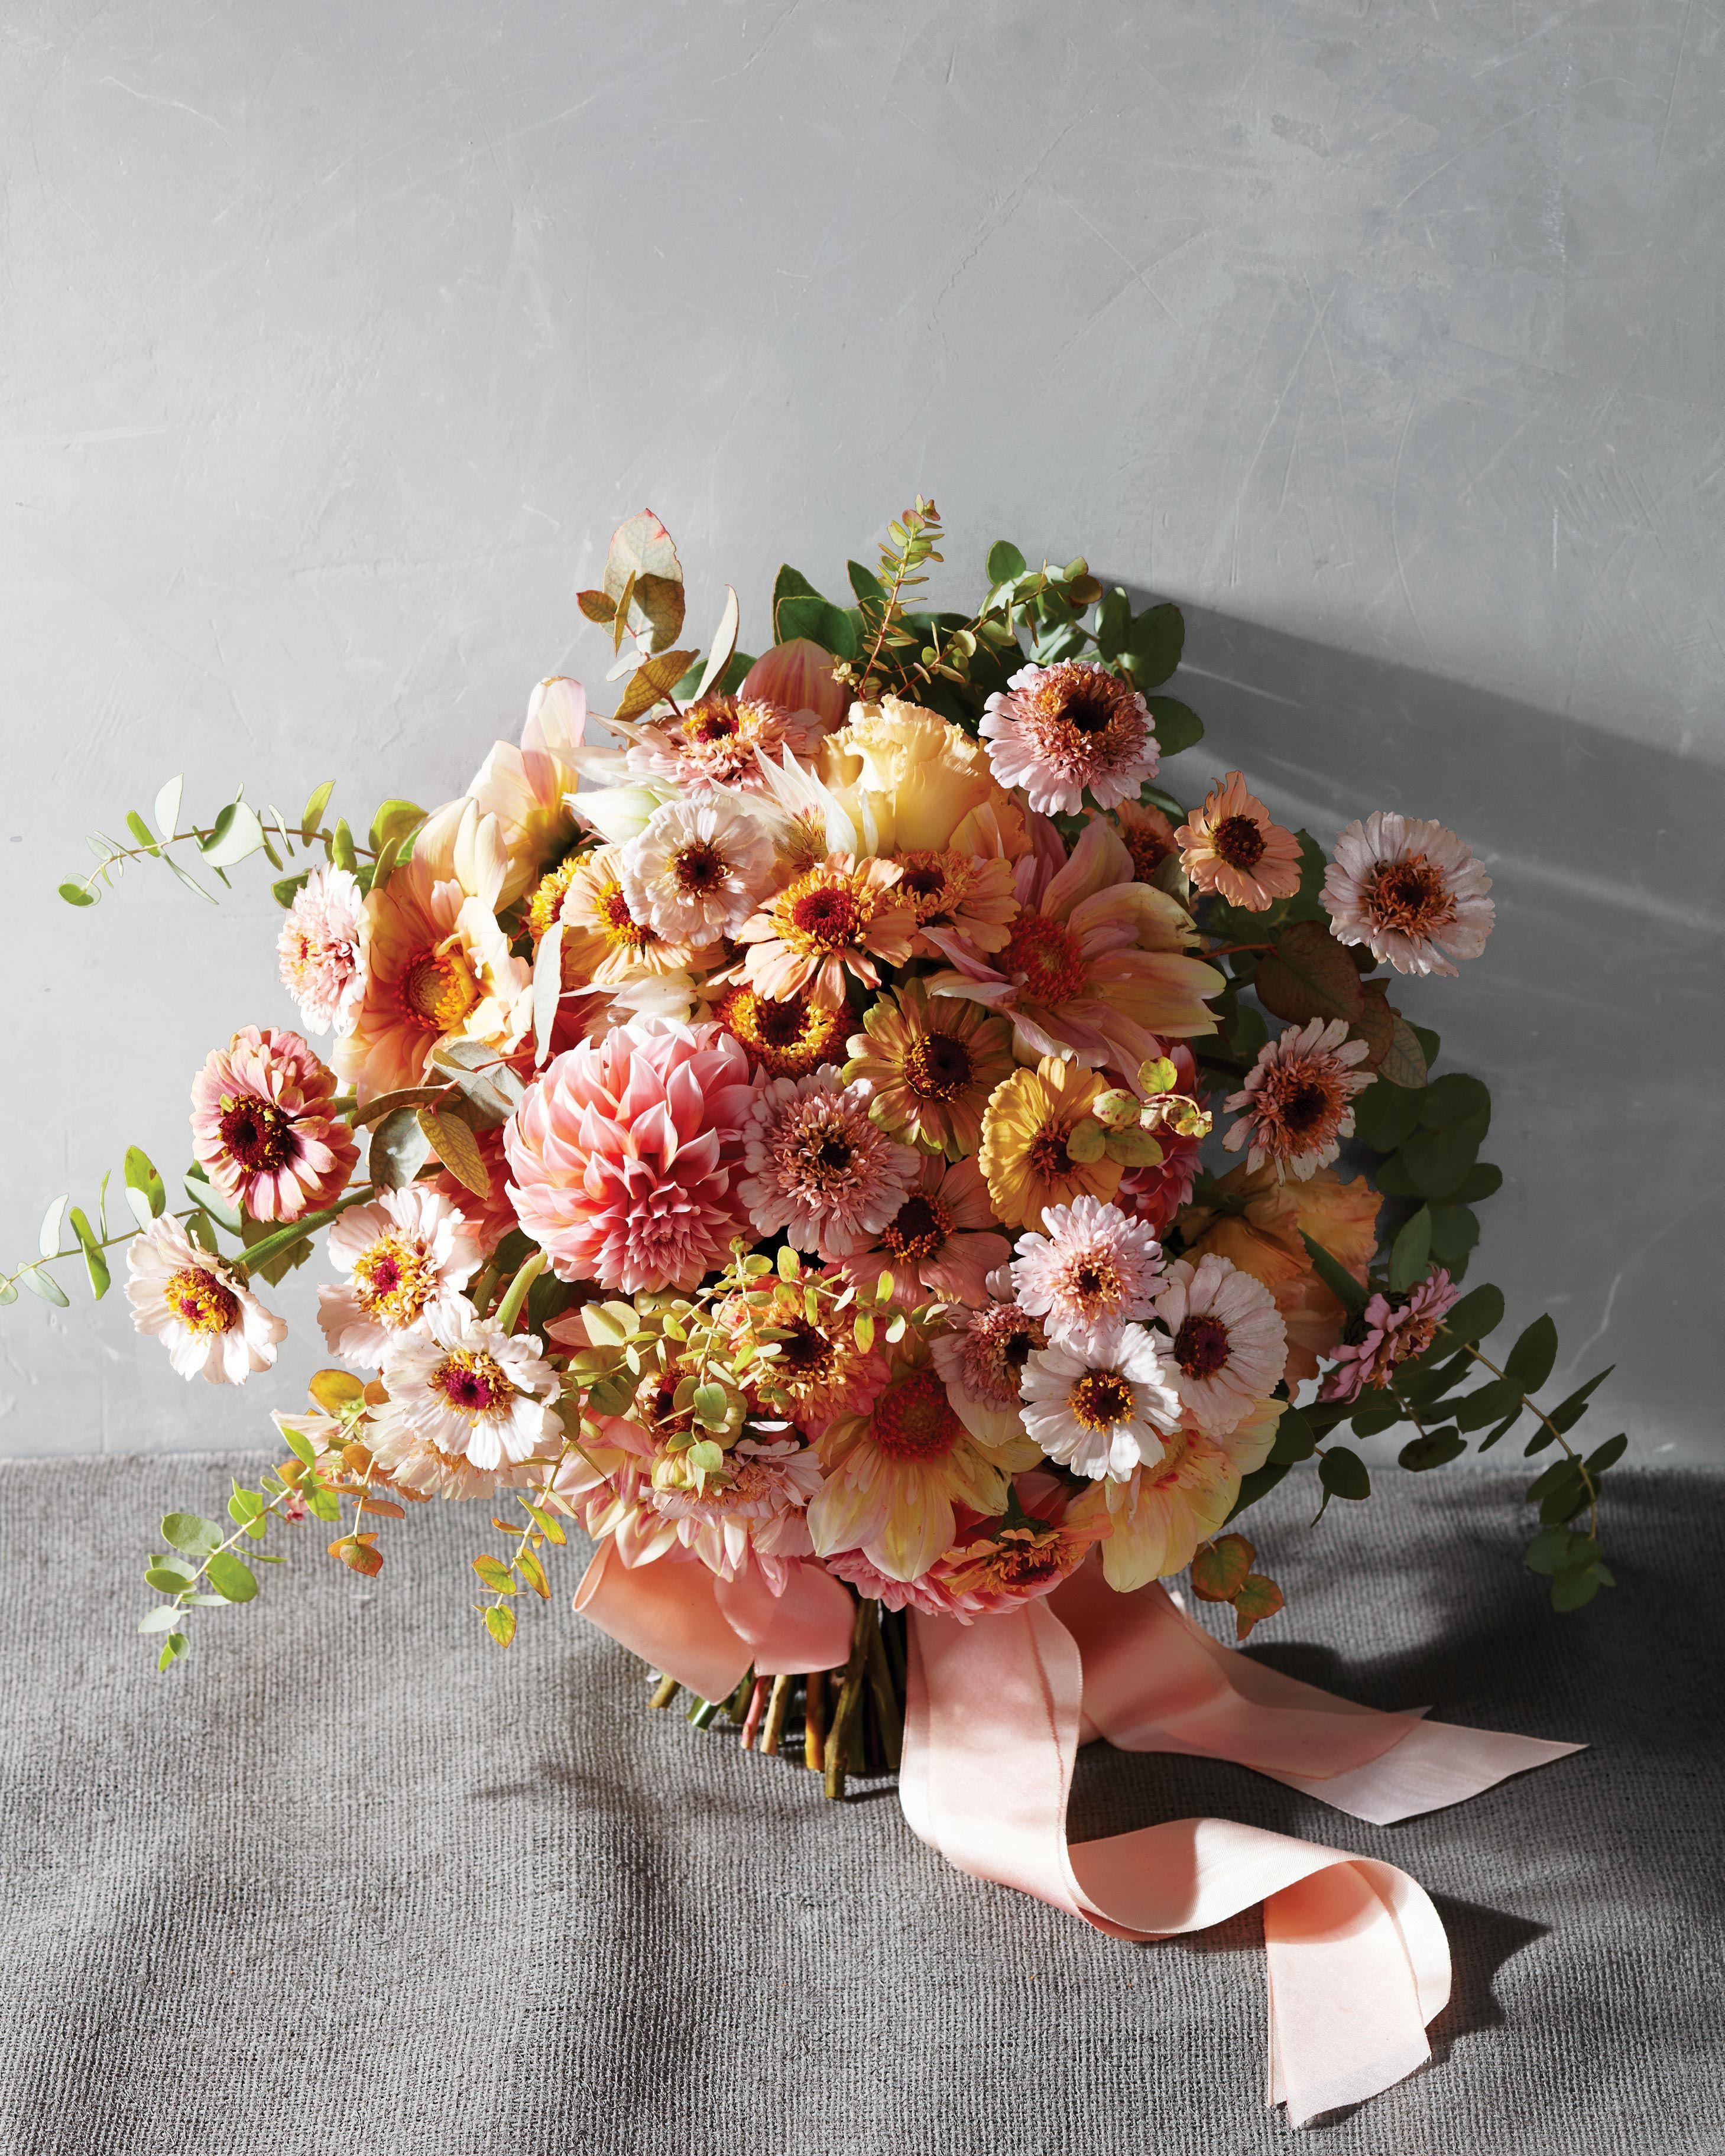 5 Stunning Ways To Use Zinnias In Your Wedding Dahlias Wedding Red Bouquet Wedding Dahlia Bouquet